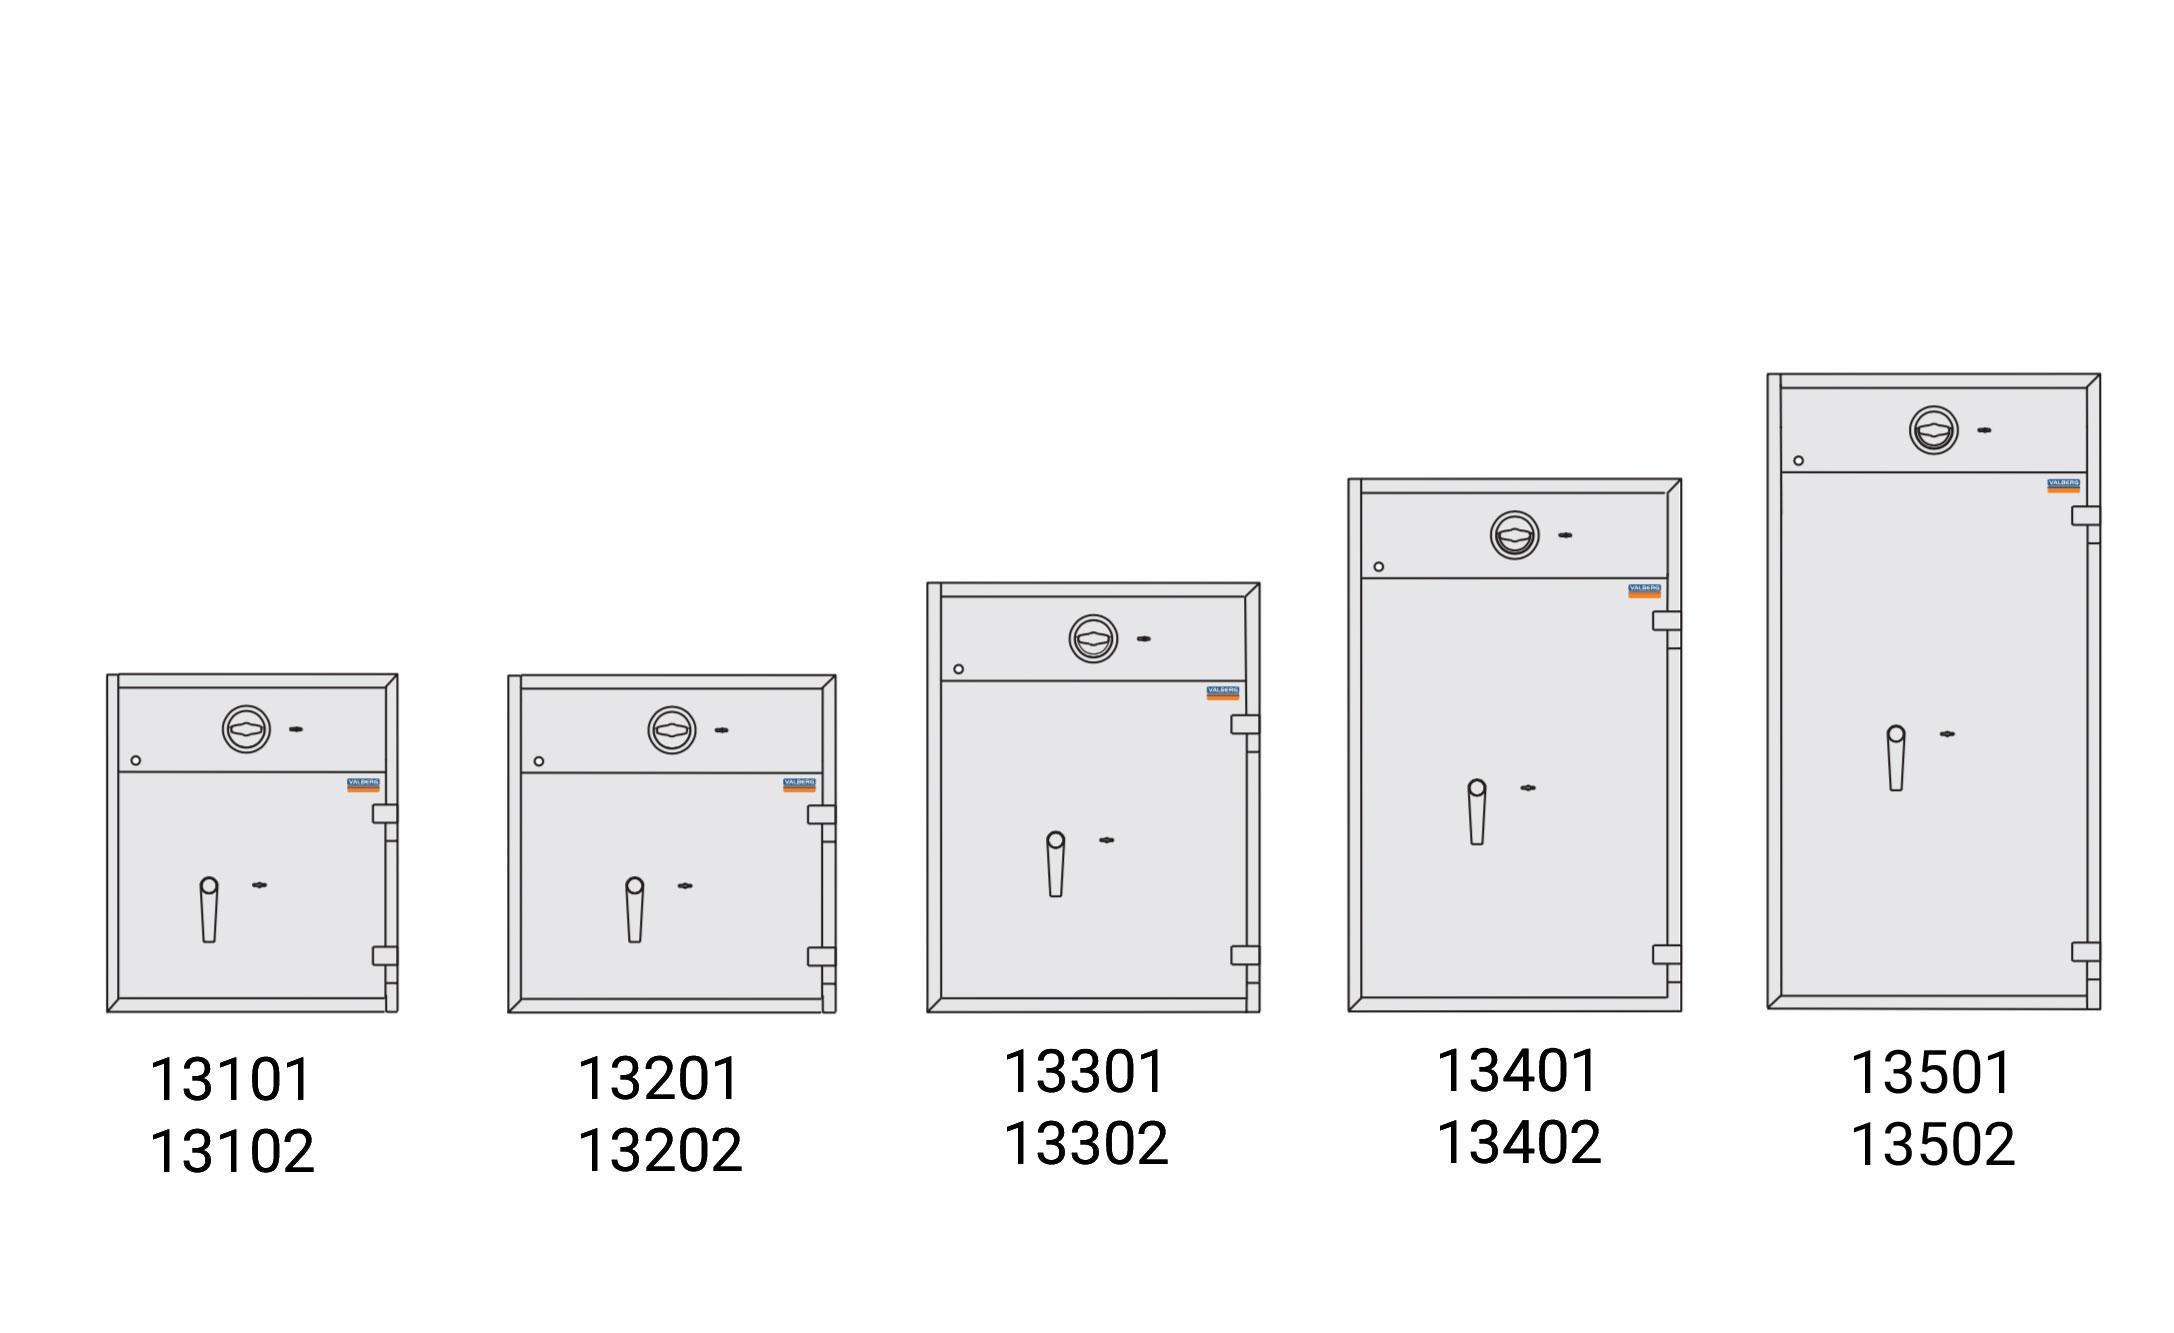 bersicht-modell_Serie_13000QA4zbc7wJSgsG